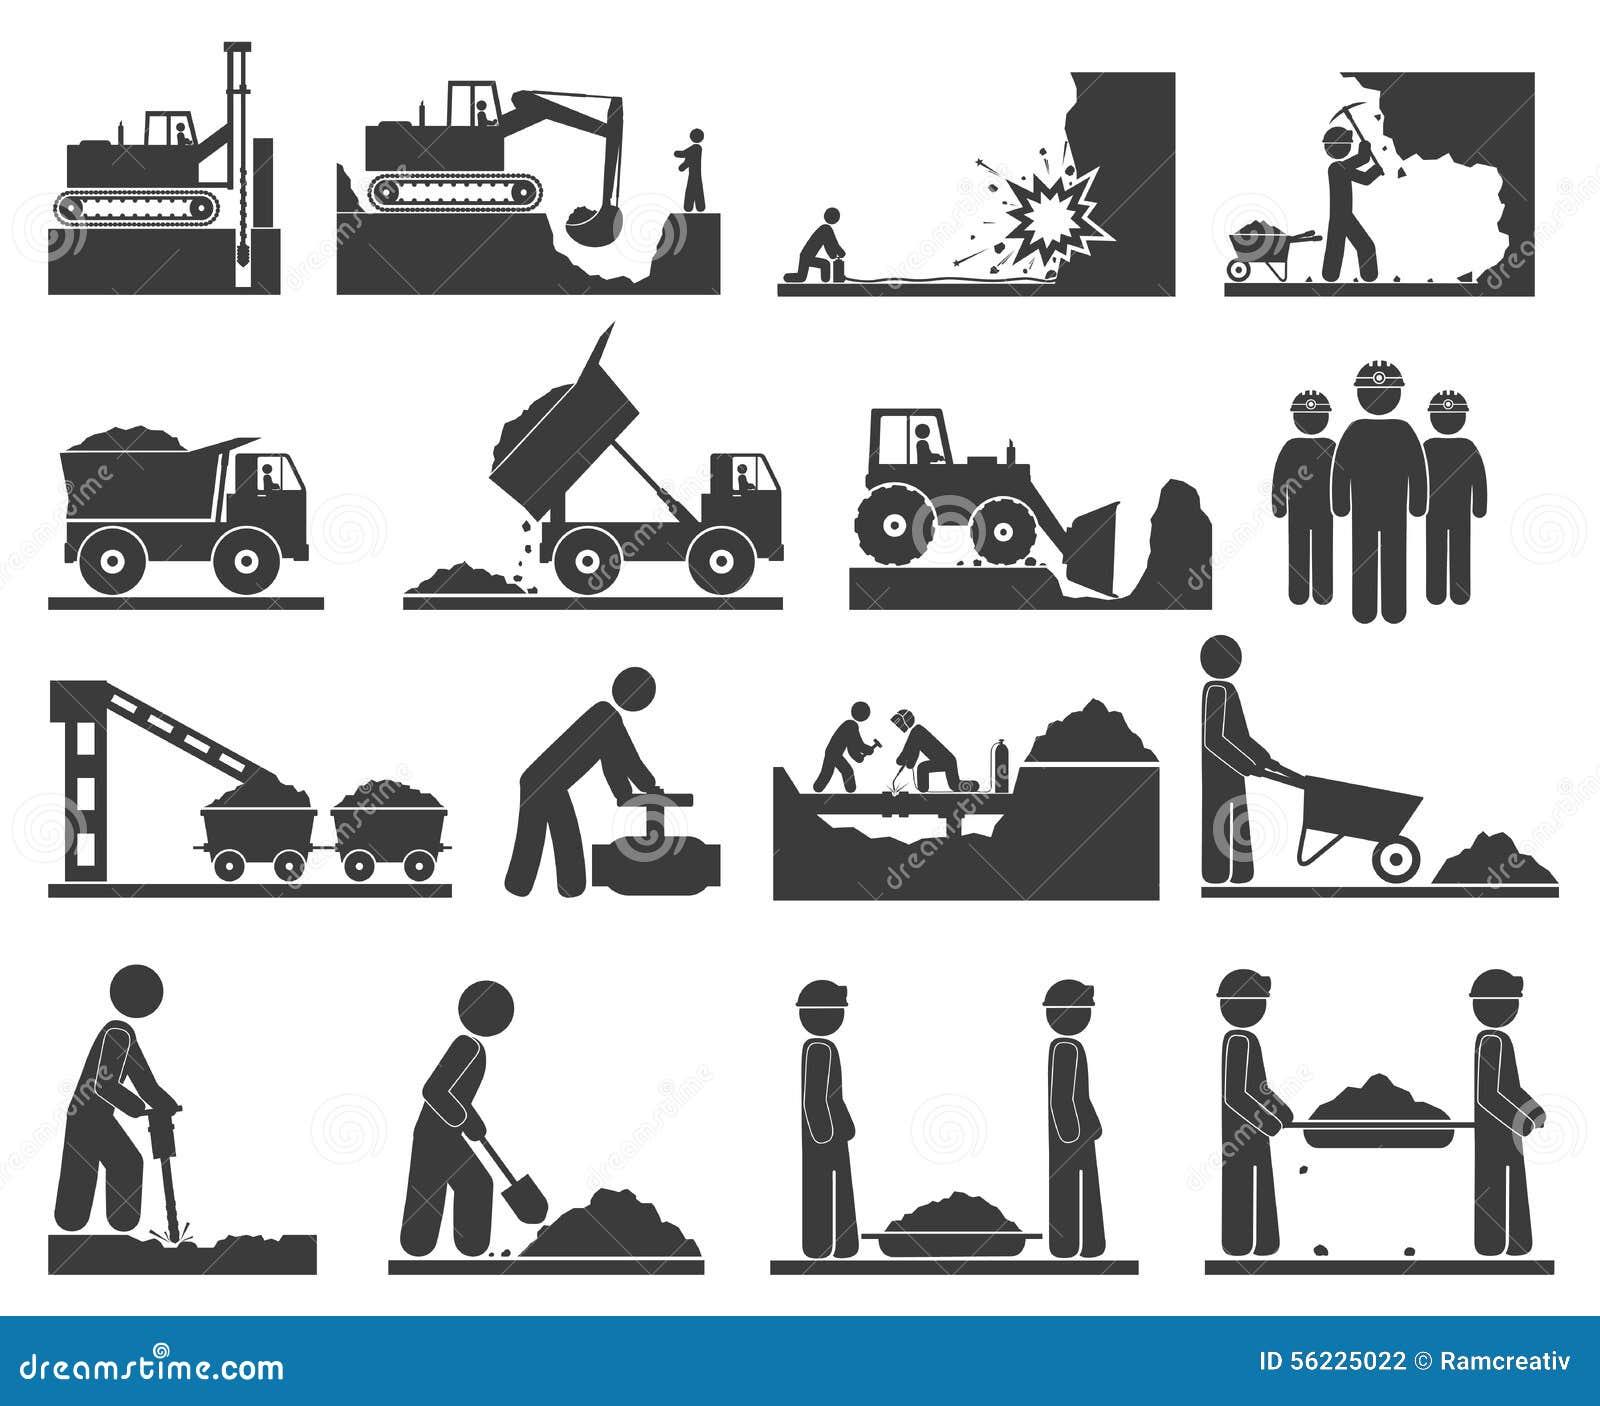 Ð ¡ onstruction开采和挖掘煤炭,油的土堤象